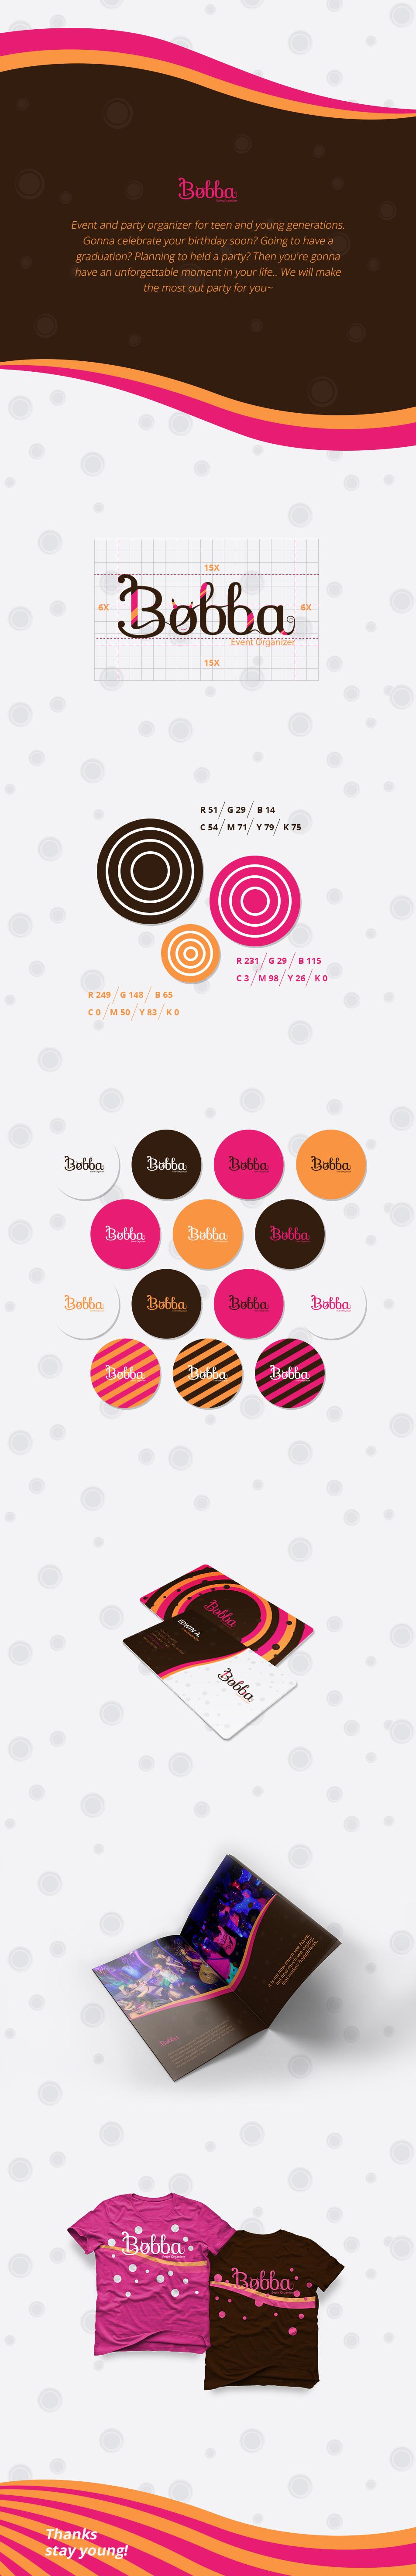 bobba event organizer design Fun Young teen brown pink color t-shirt stationary logo